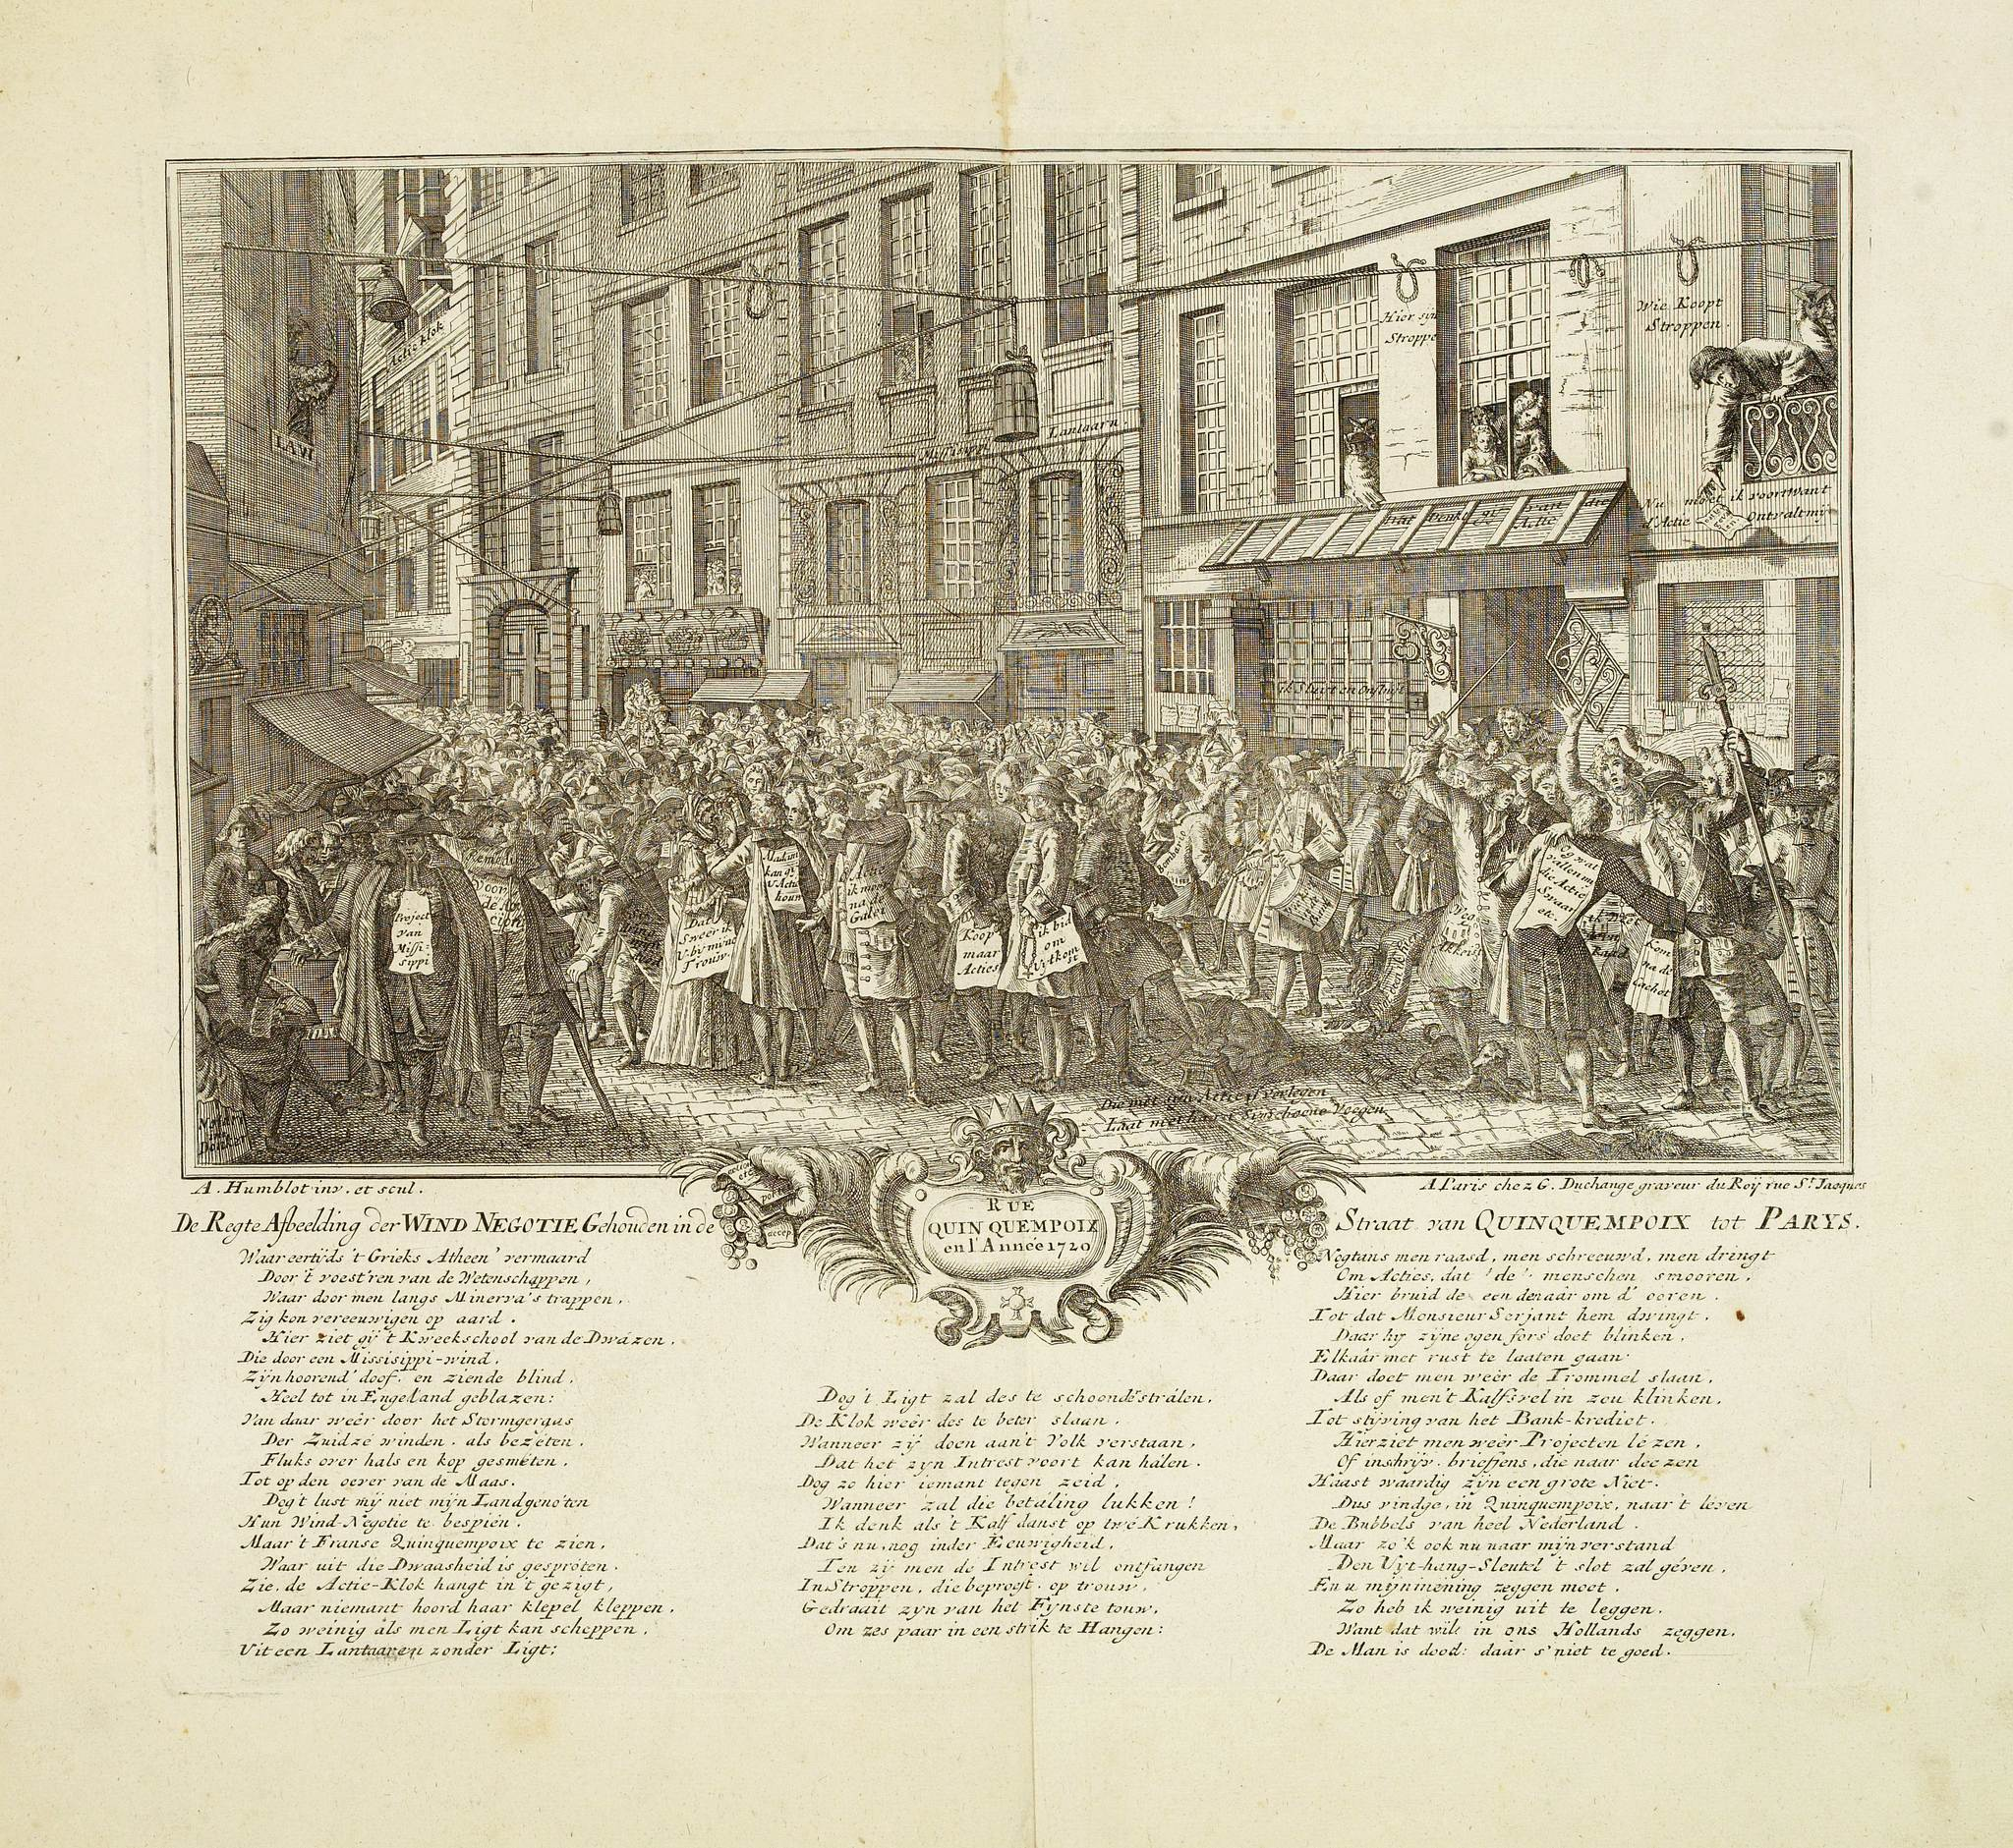 ANONYMOUS -  Rue Quinquempoix en l'année 1720. De regte afbeelding der wind negotie gehouden in de straat van Quinquempoix tot Parys.